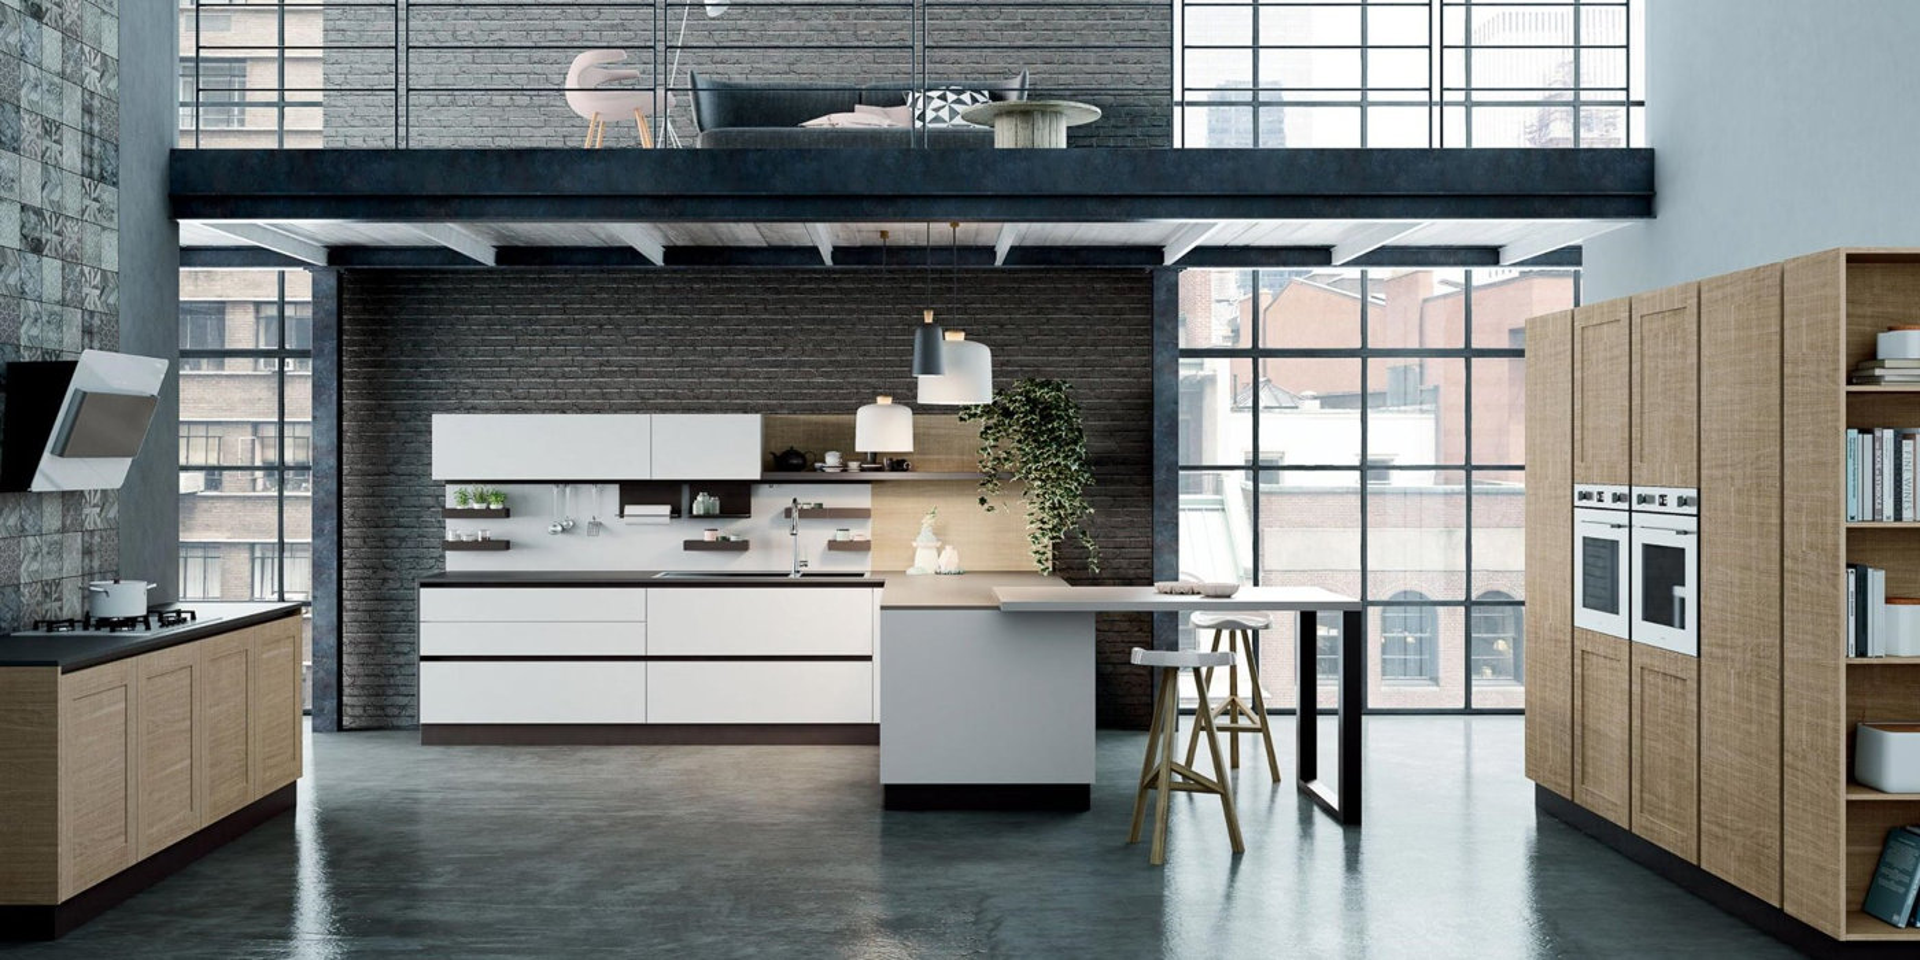 Produttori Cucine. Good Sistemi Di Gestione Innovativi Assicurano La ...